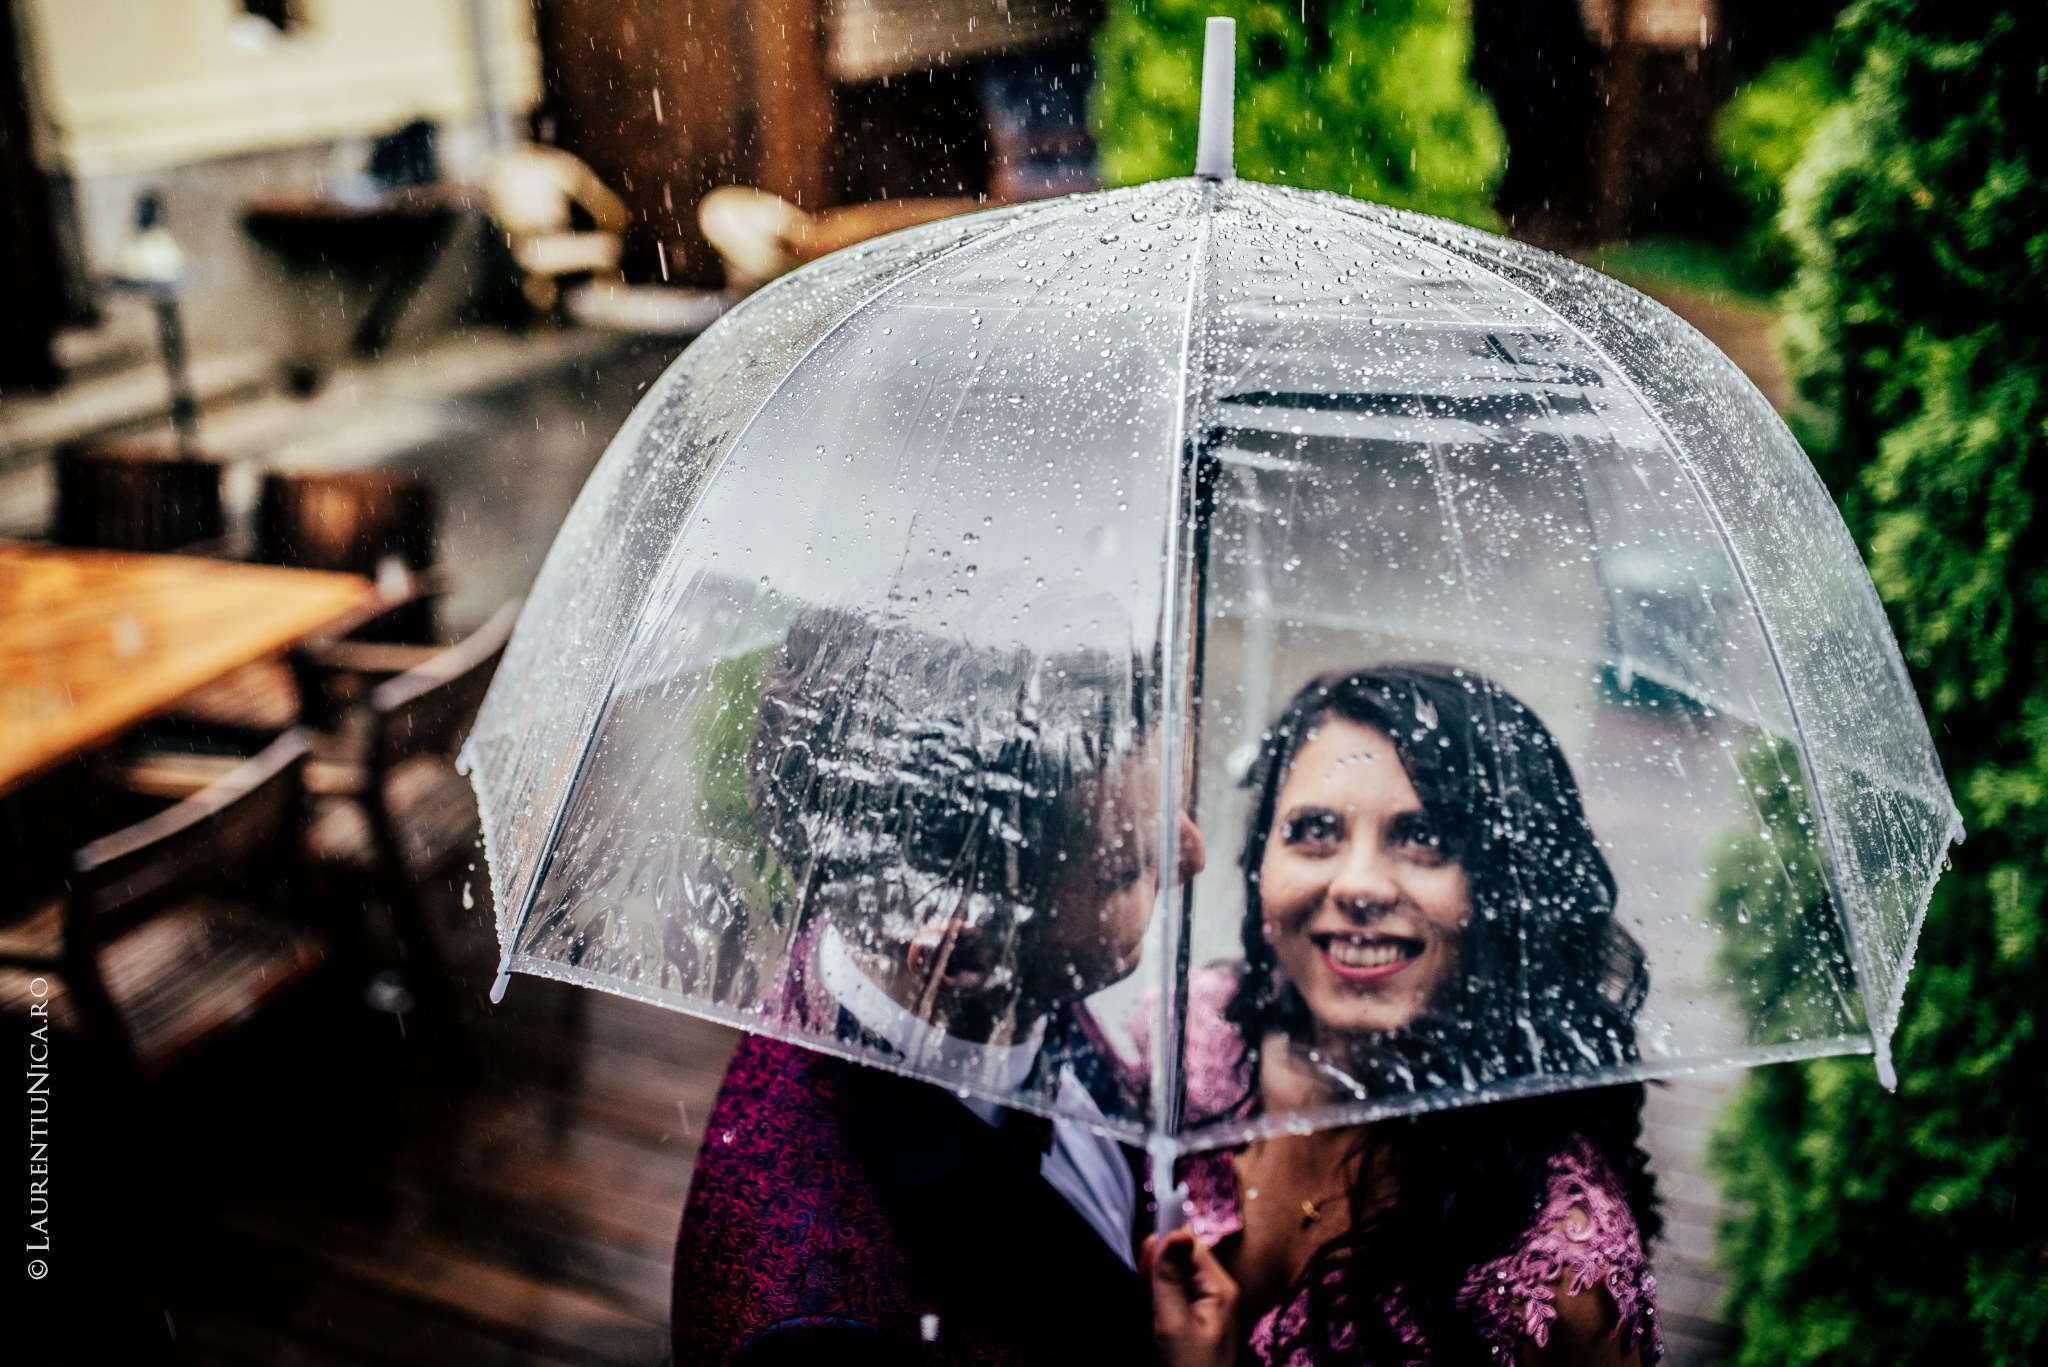 fotografii nunta craiova bia alex fotograf nunta laurentiu nica 03 - Bia & Alex | Fotografii nunta | Craiova